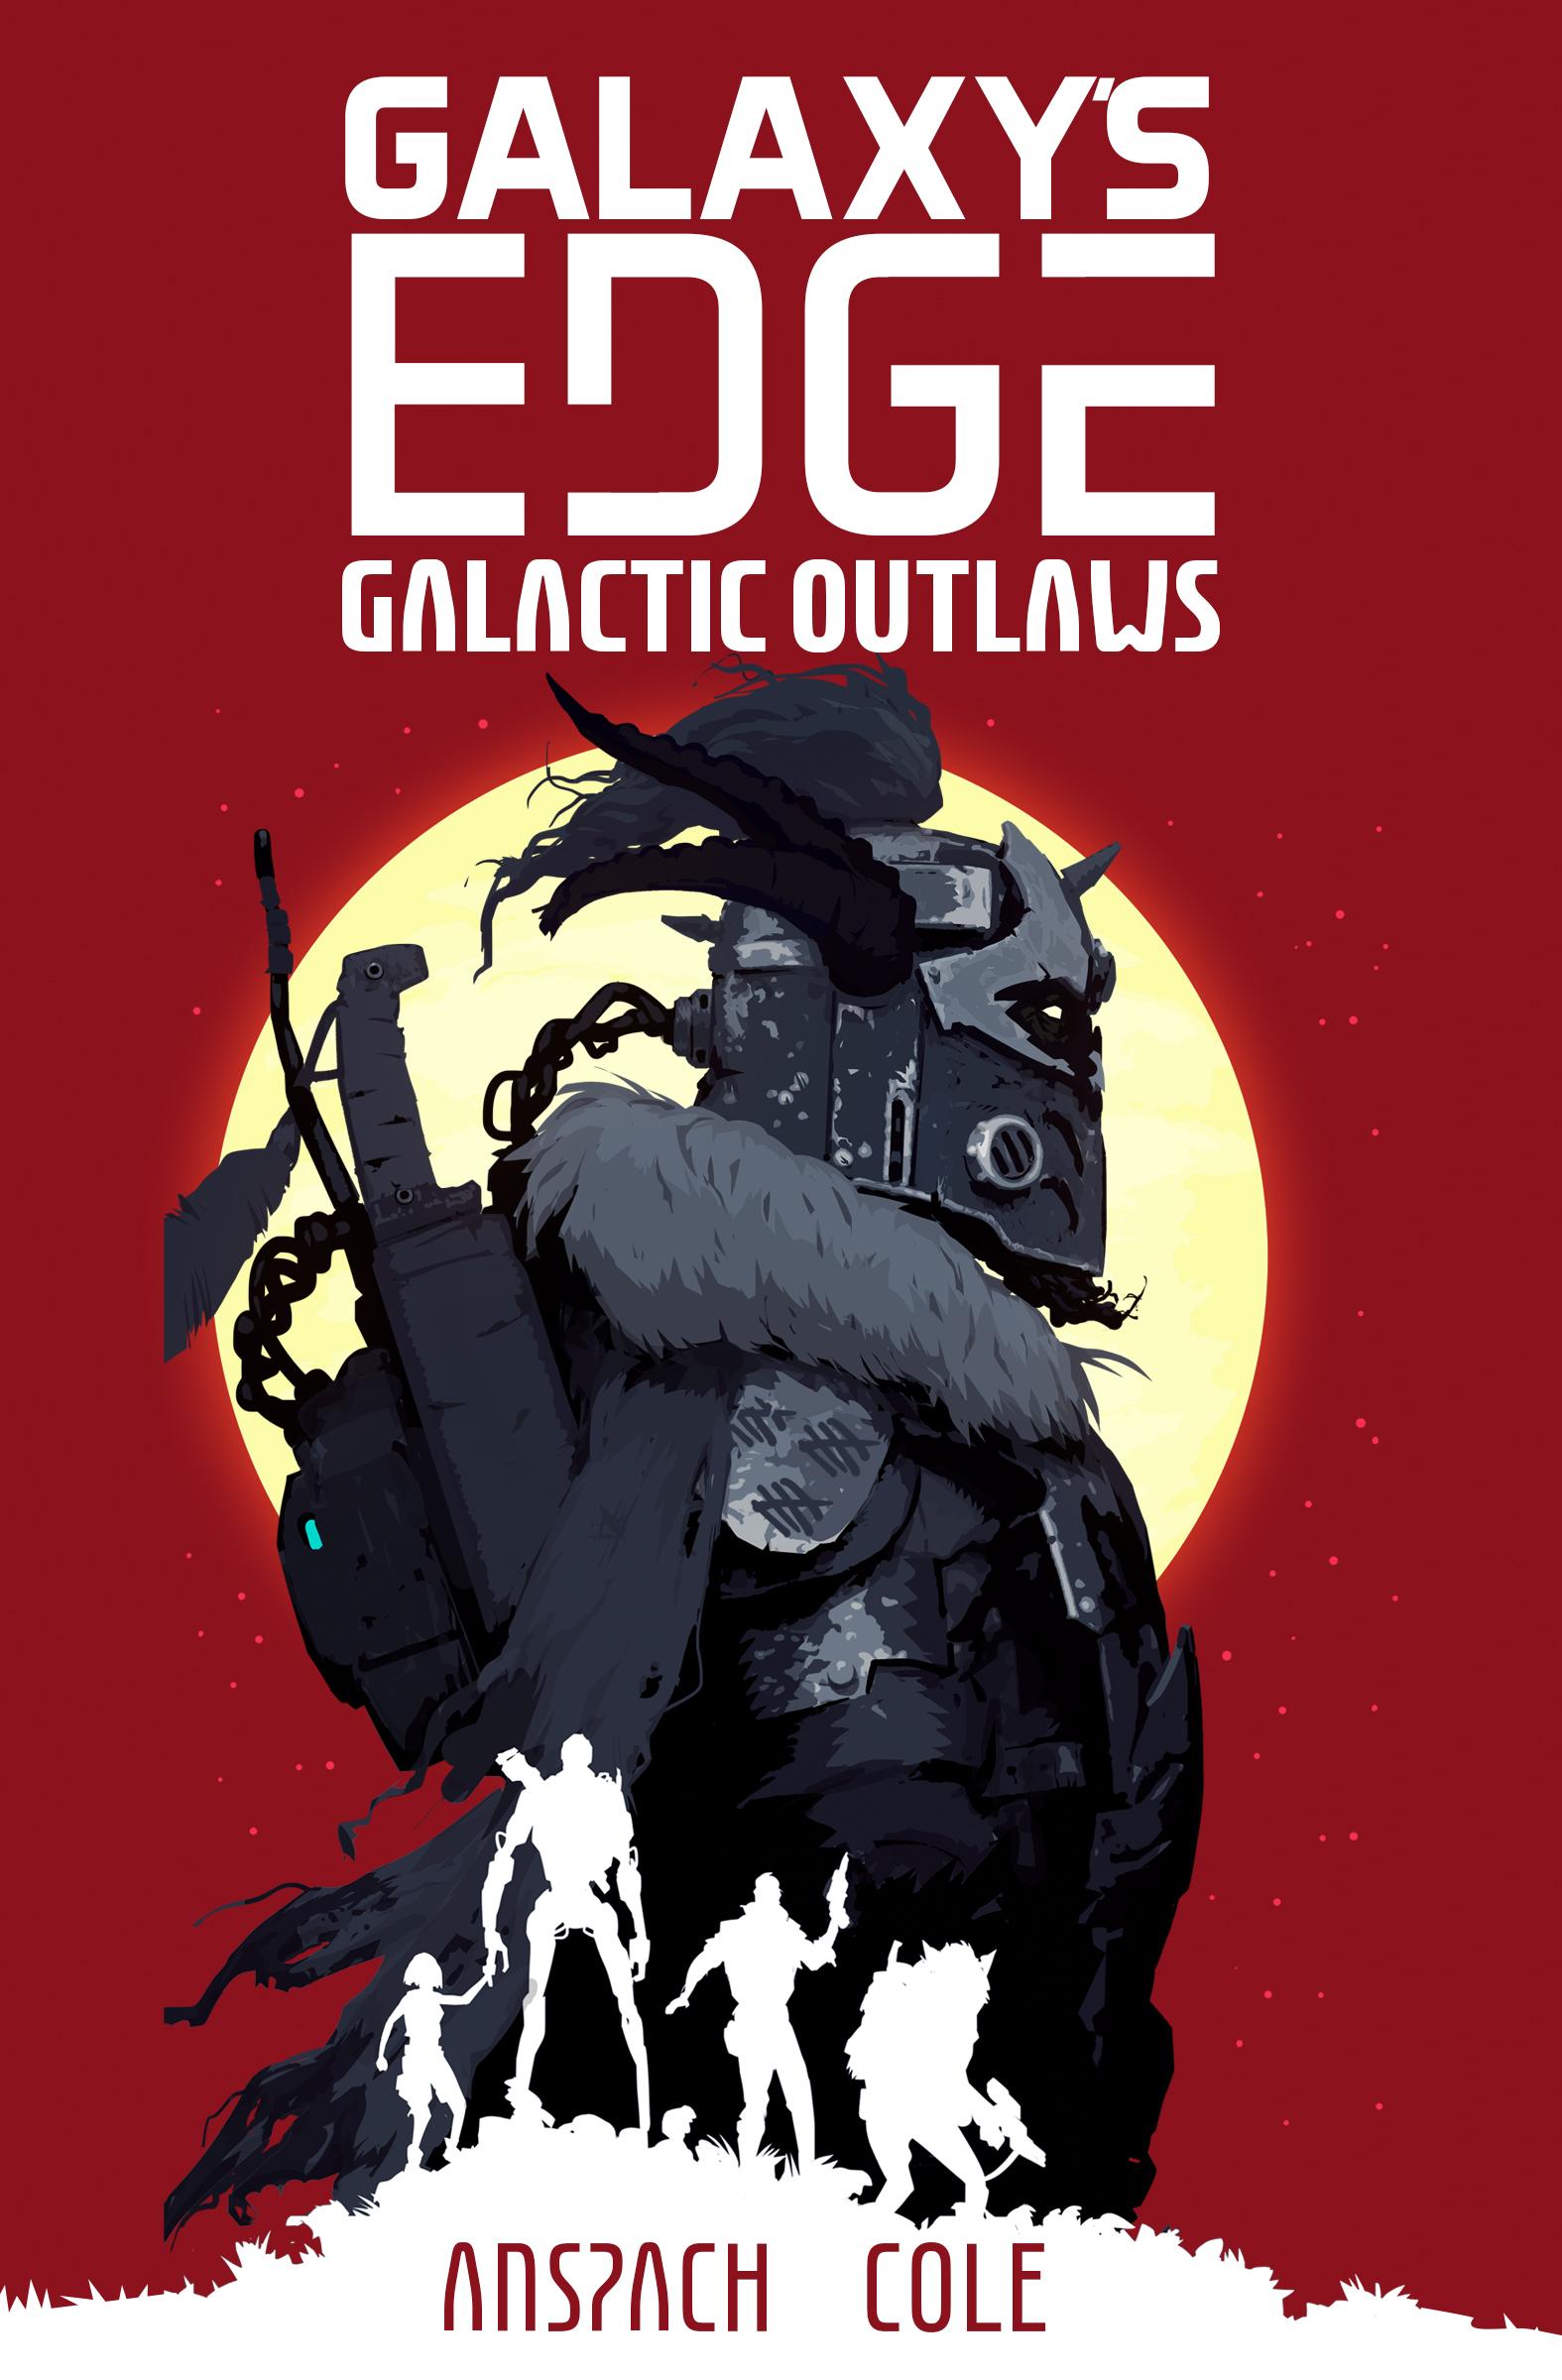 Galaxy's Edge - Galactic Outlaws